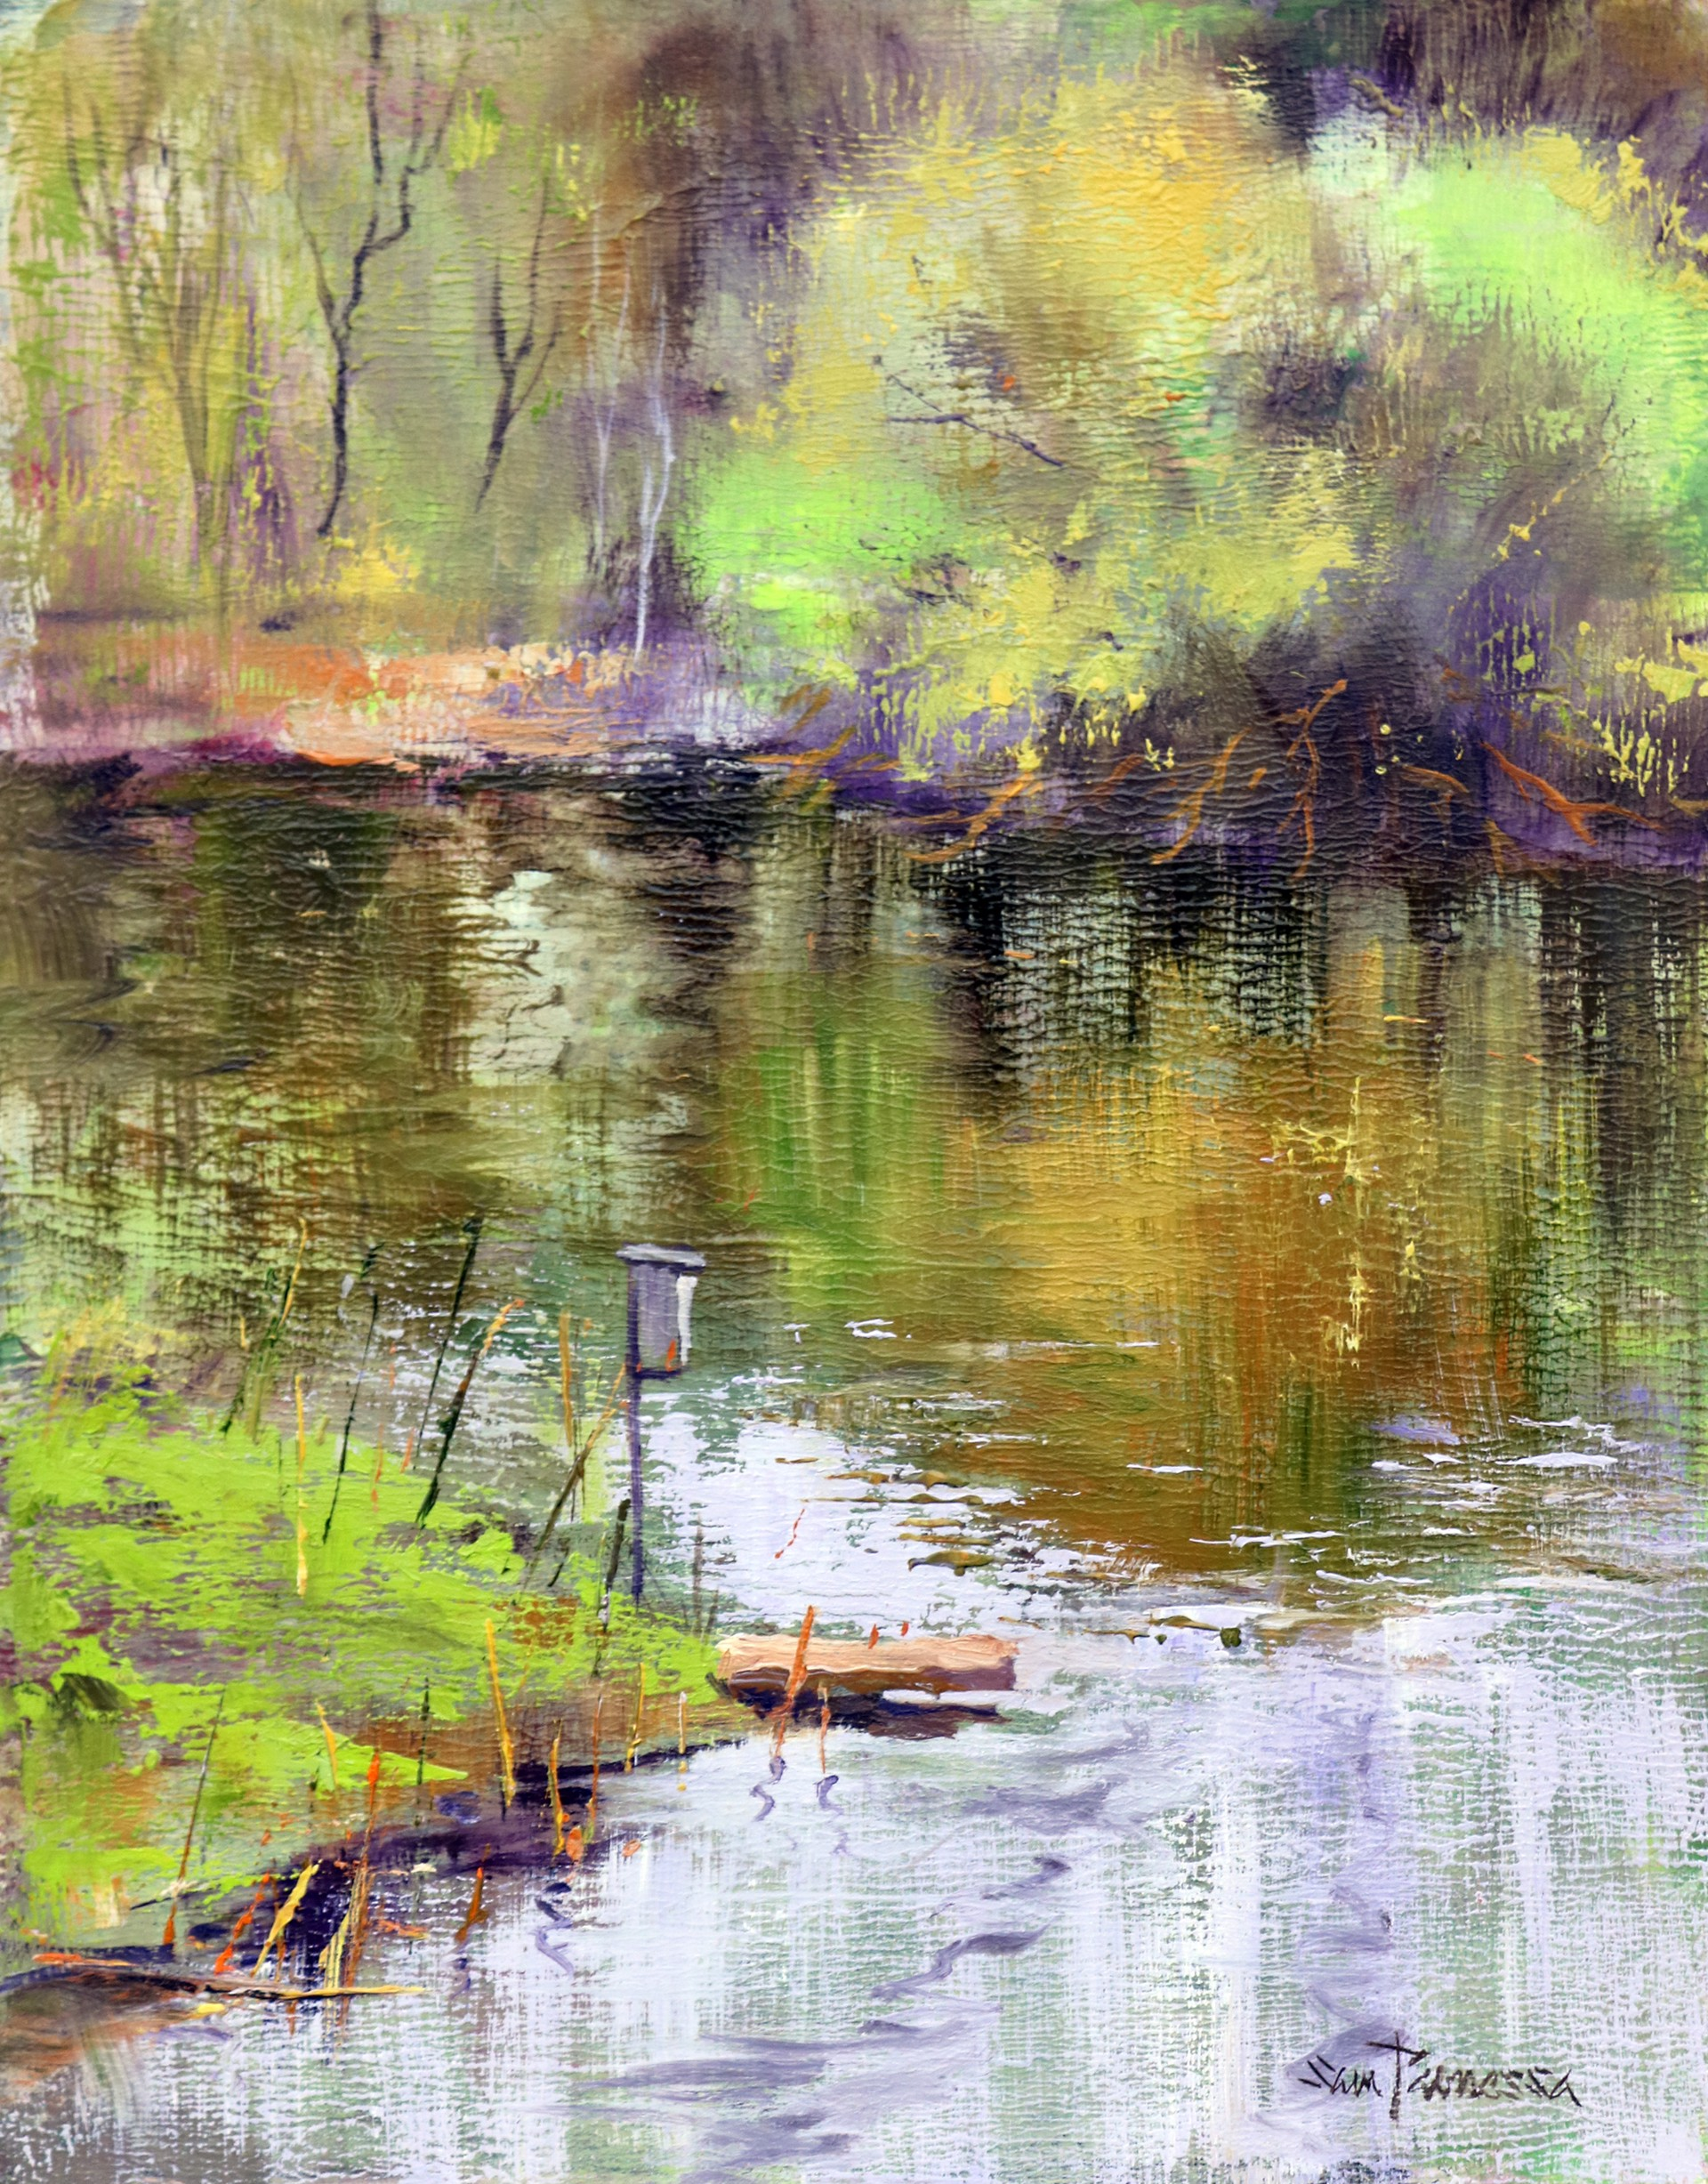 Primavera by Sam Paonessa